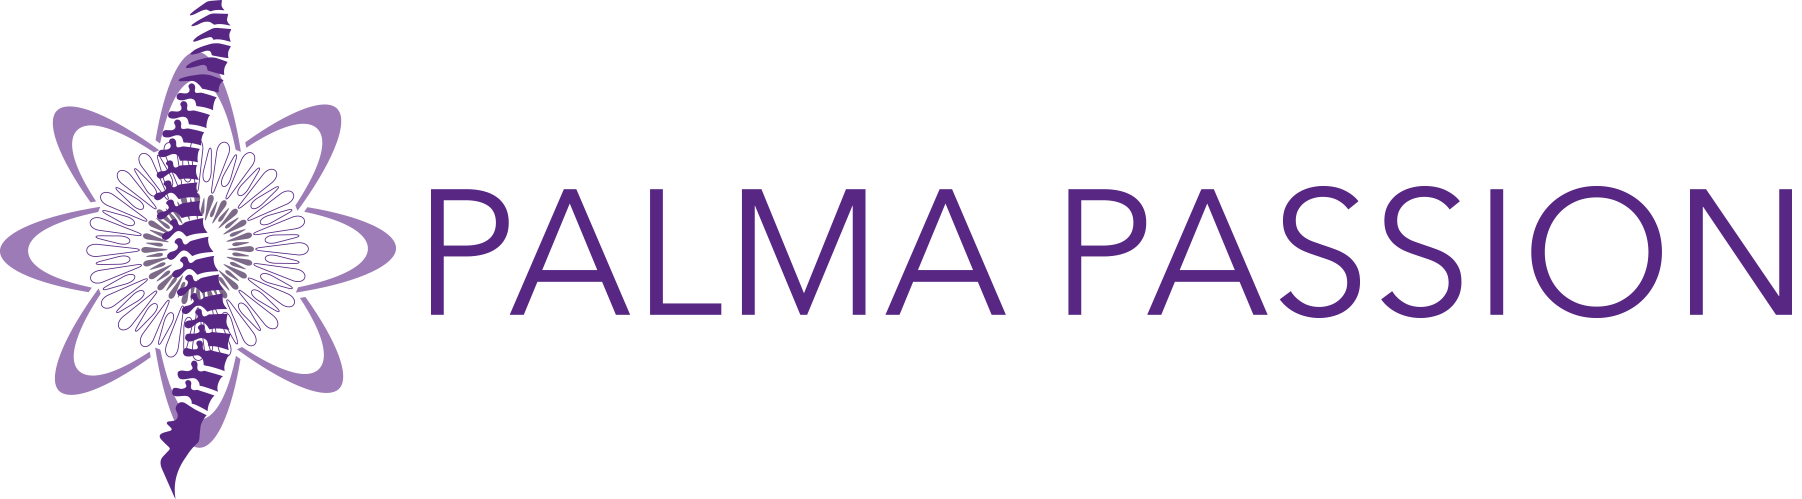 Palma-Passion